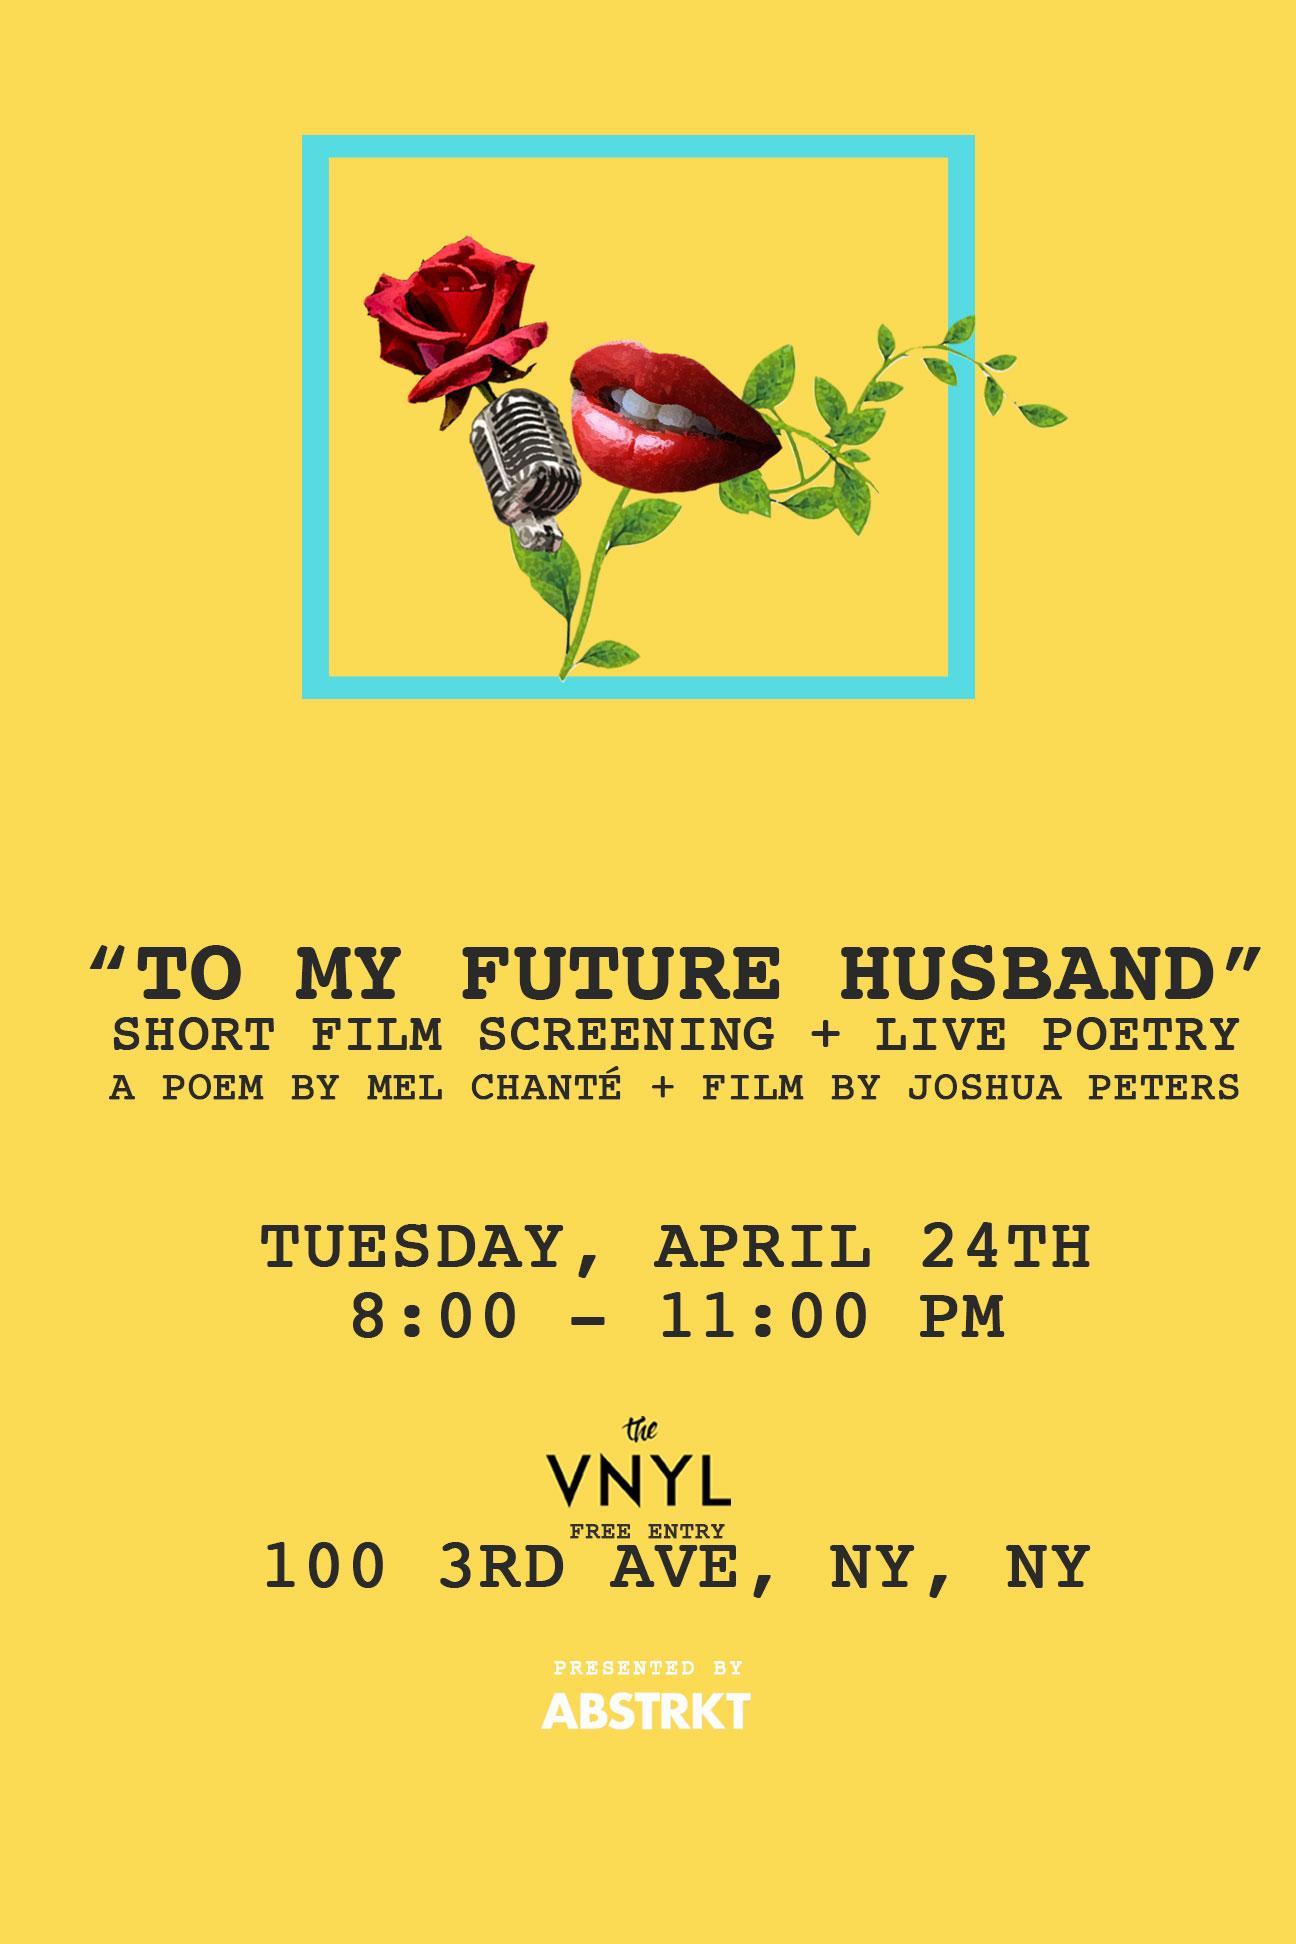 To My Future Husband Short Film Screening Live Poetry Brokelyn